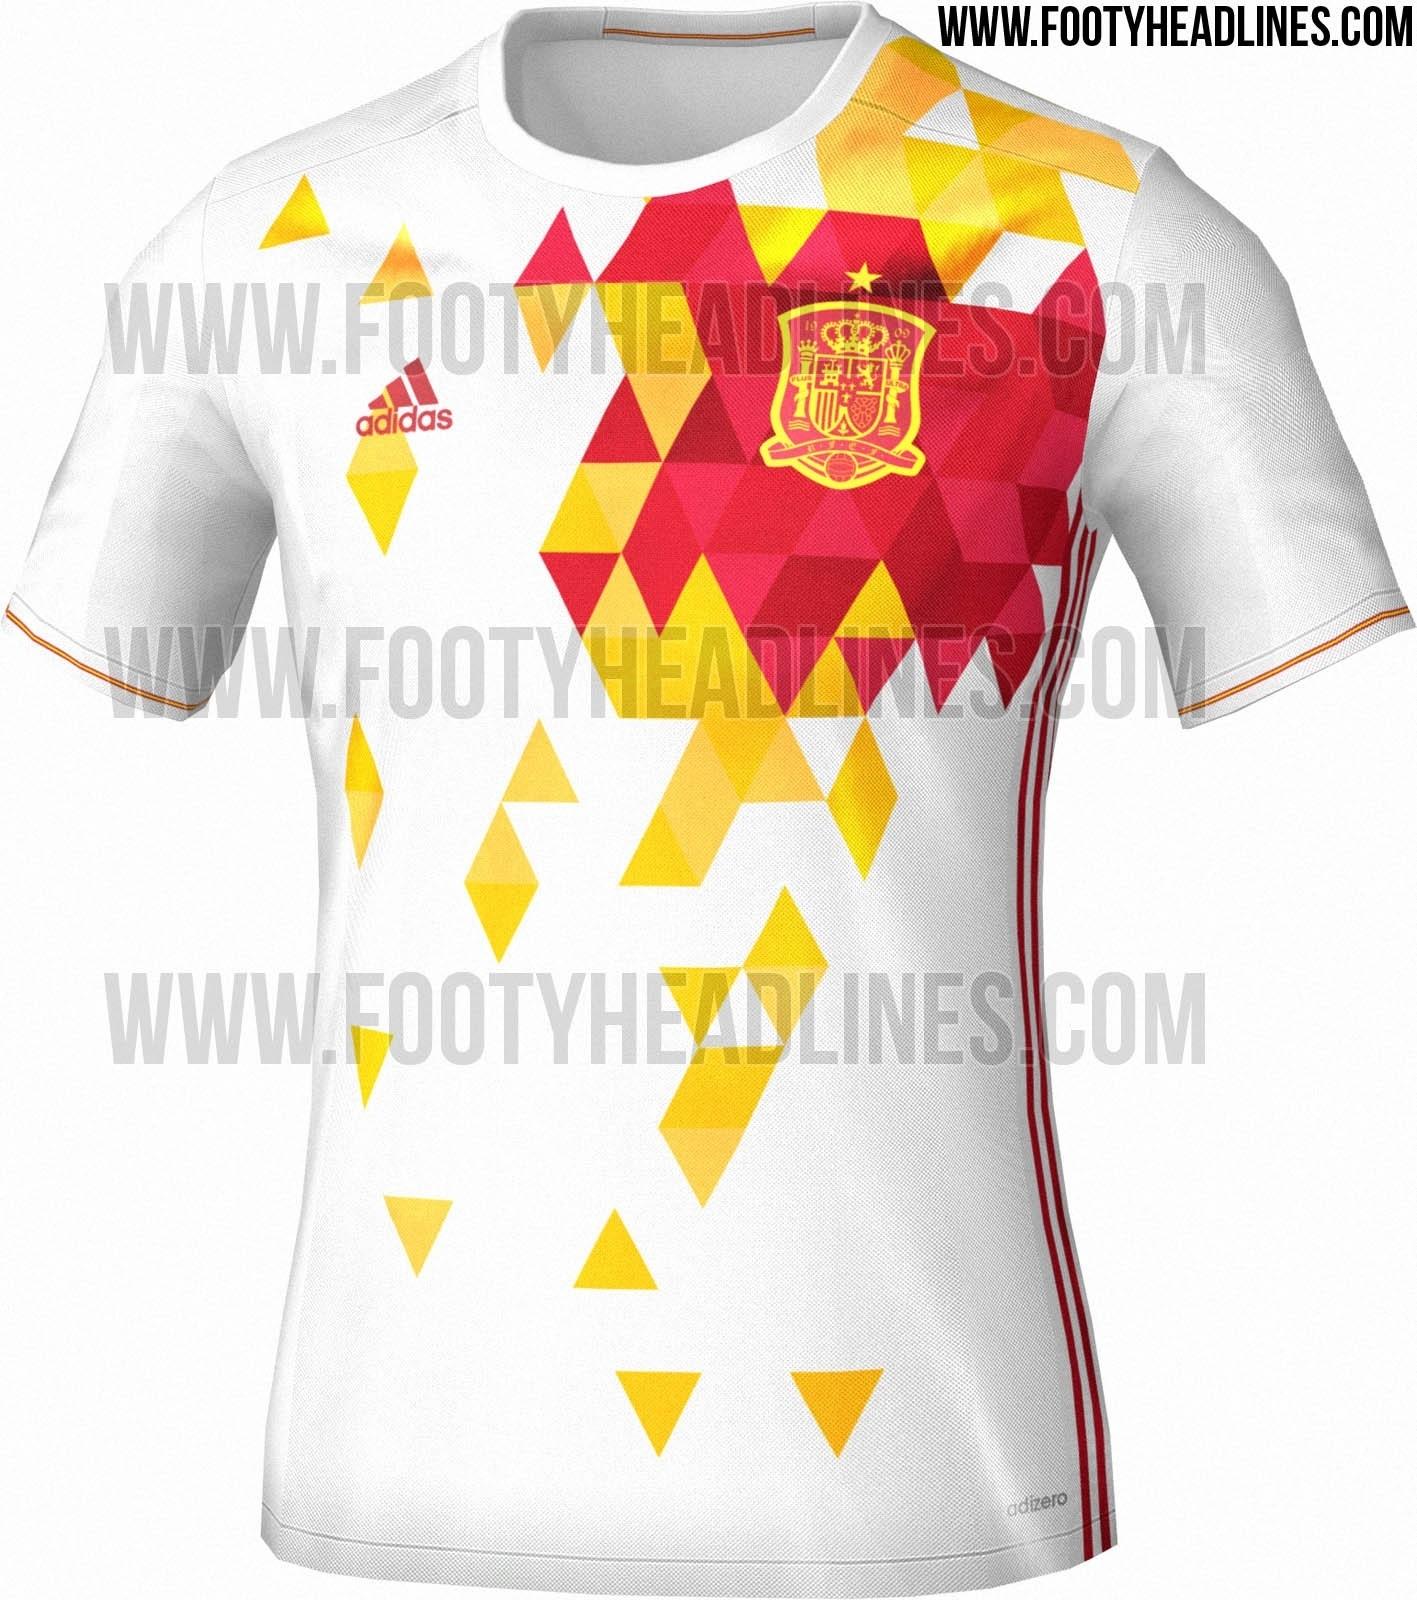 Spain-2016-adidas-new-away-kit-1.jpg